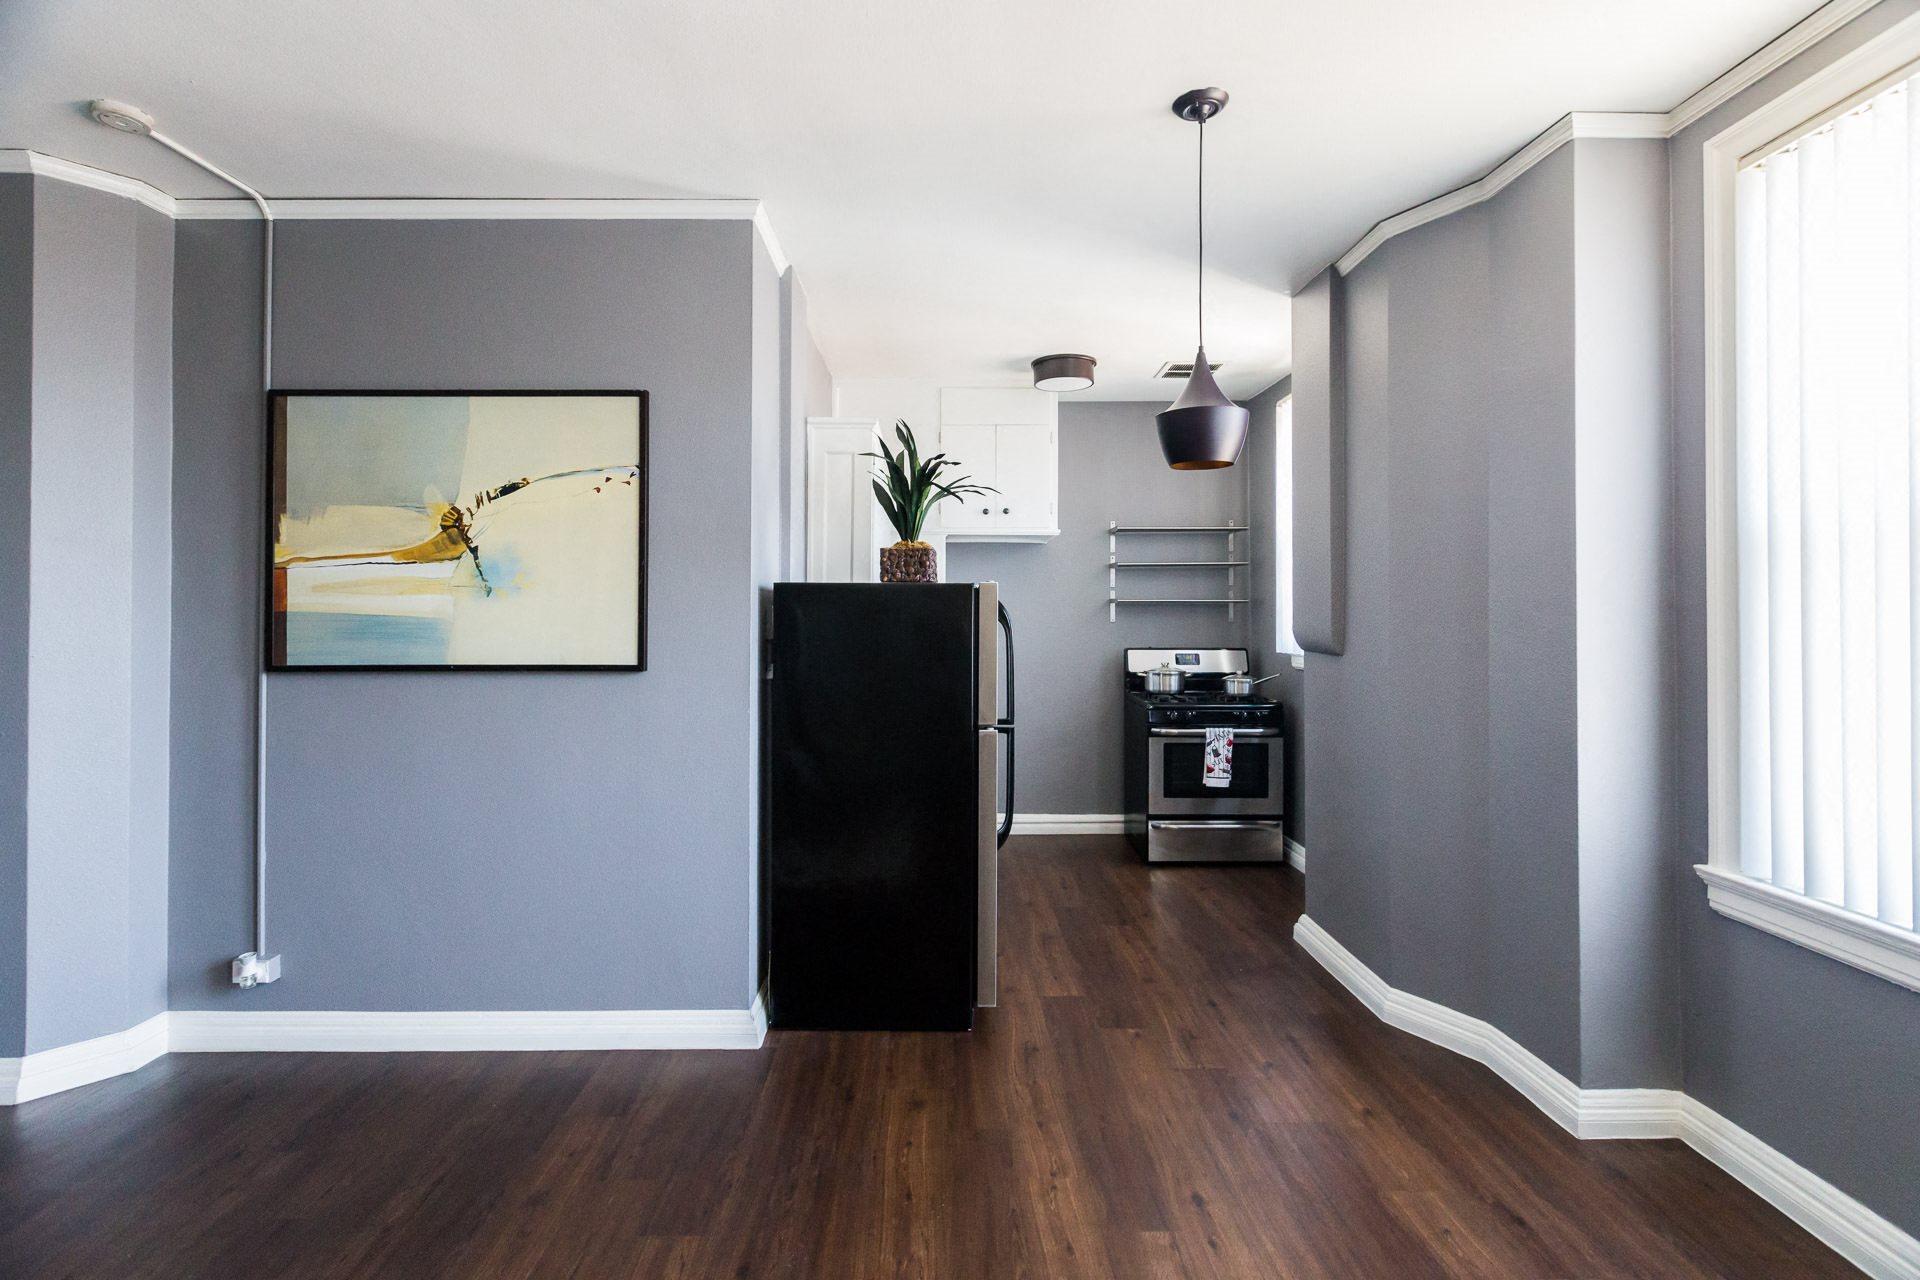 Interior Photo of Wilshire Royale Apartments, 2619 Wilshire Blvd, Los Angeles, CA 90057